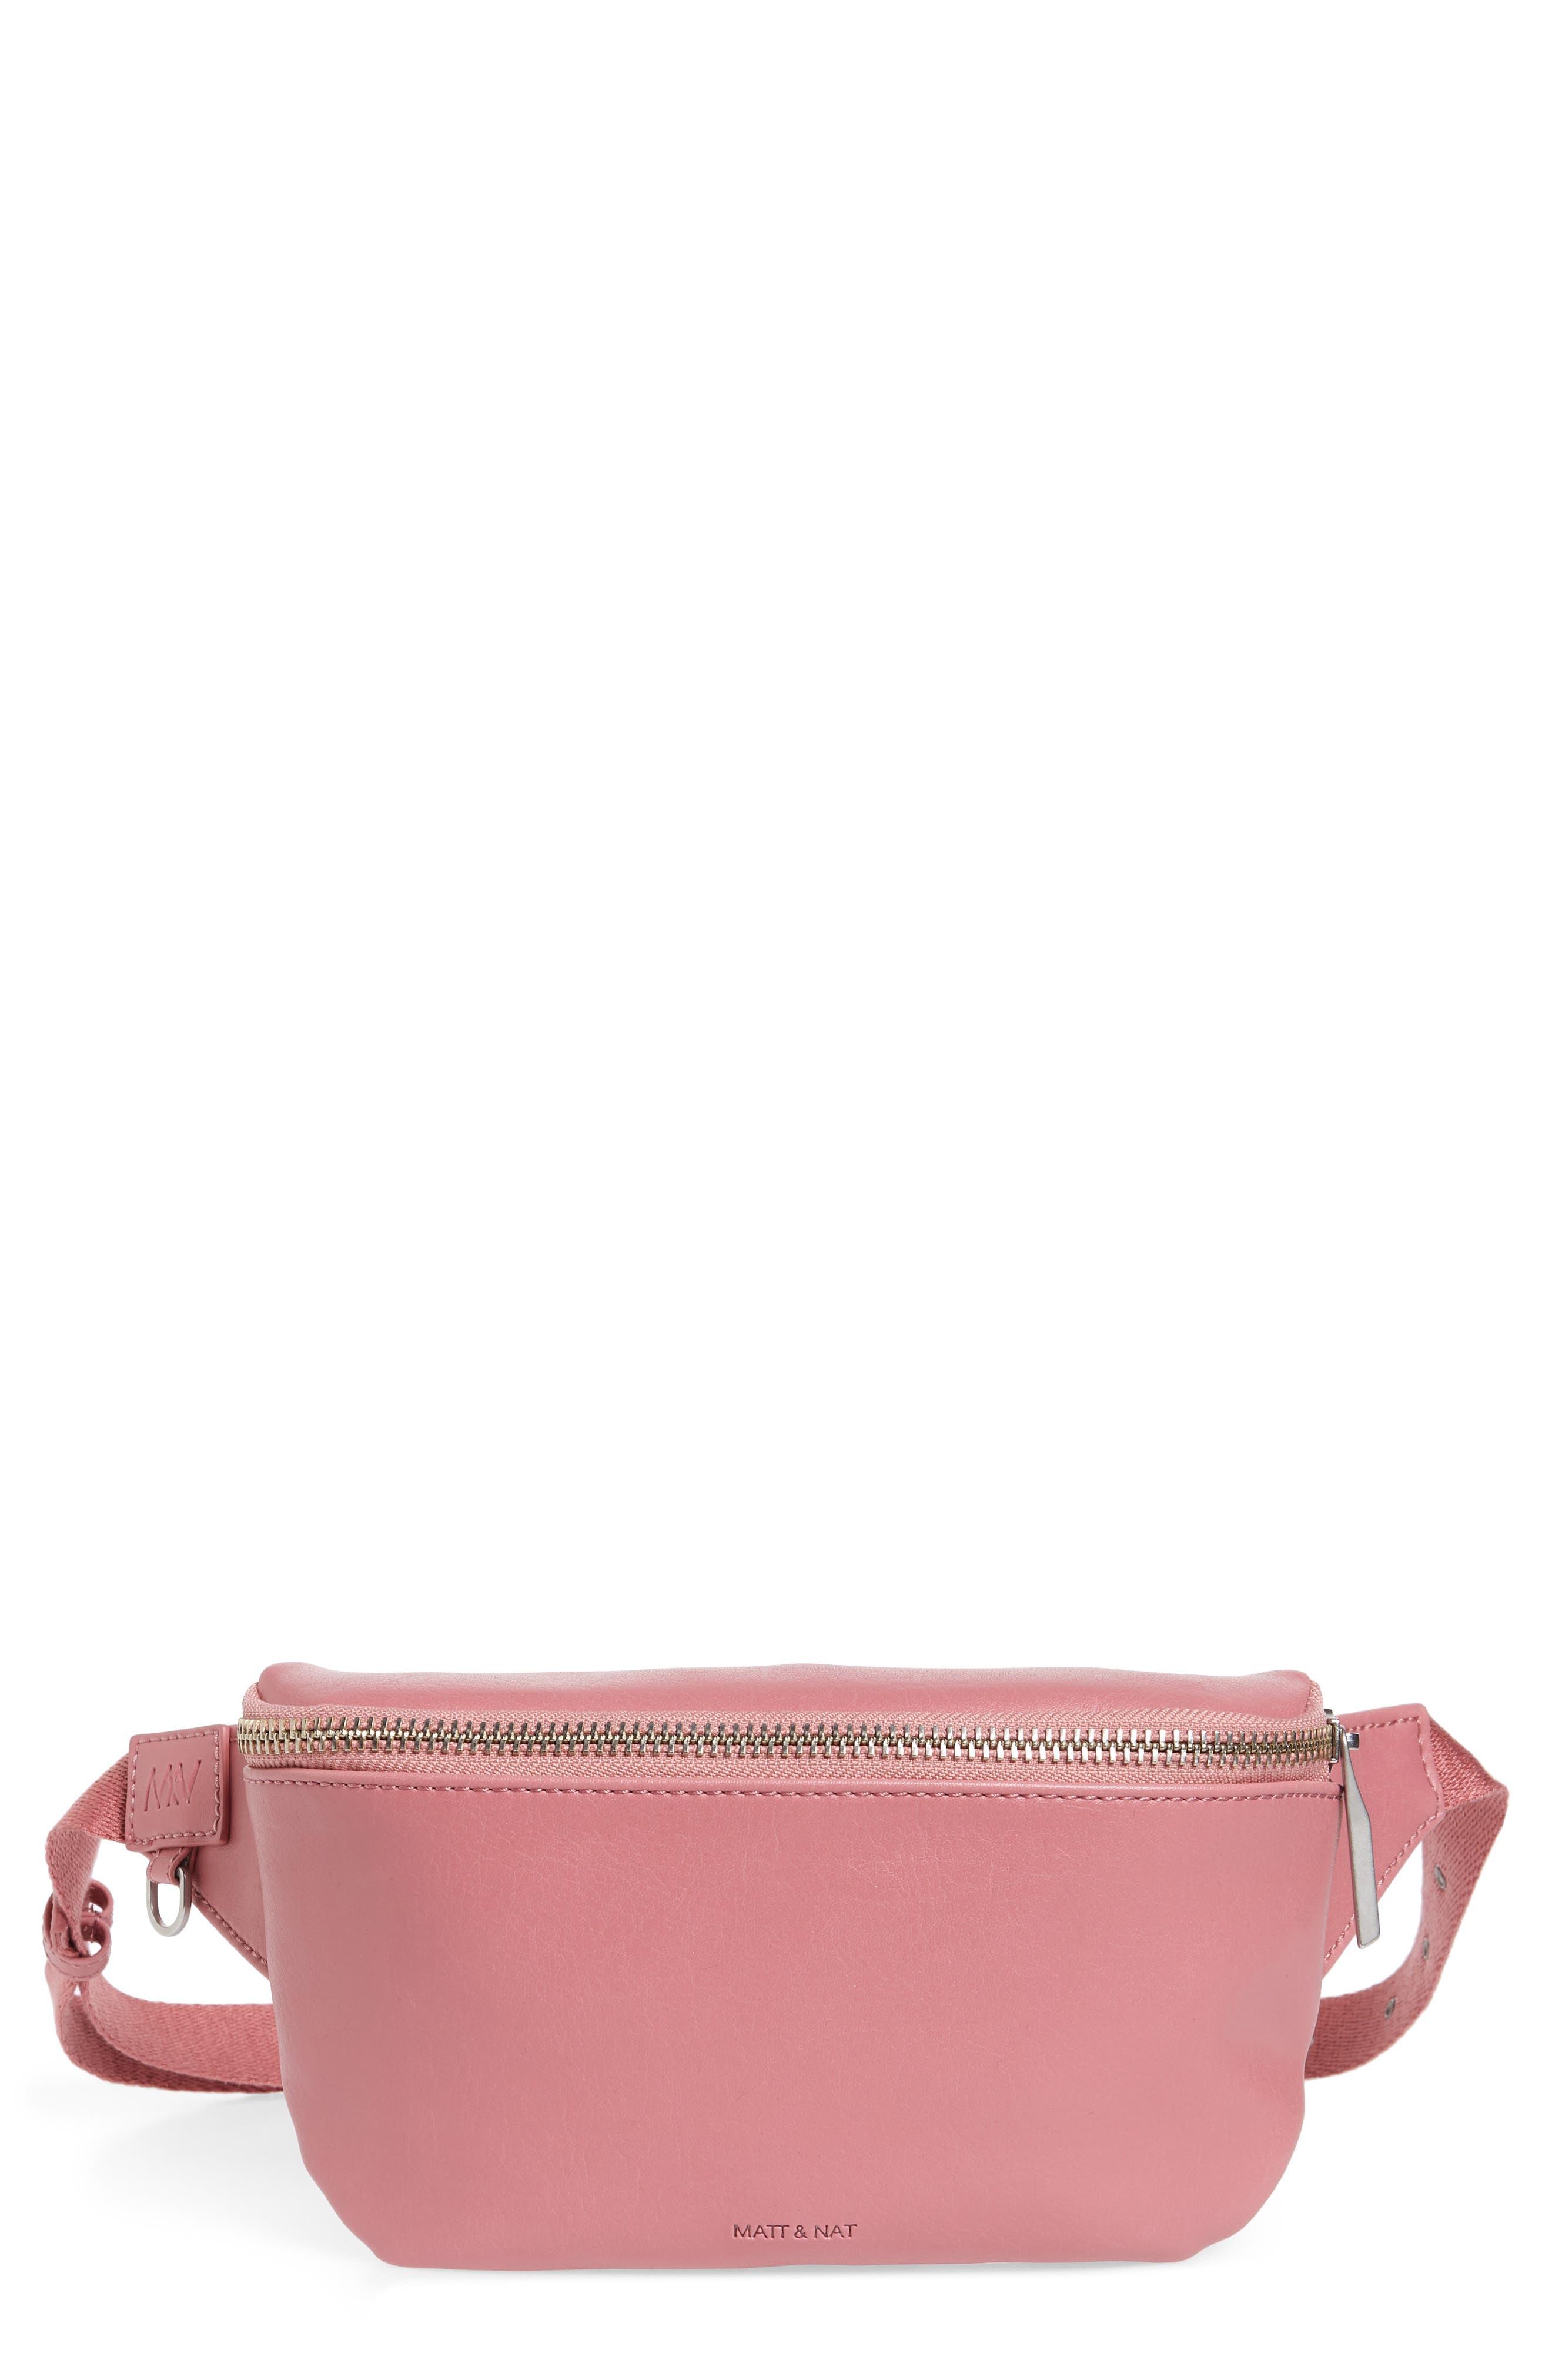 Matt & Nat Vie Faux Leather Belt Bag - Pink